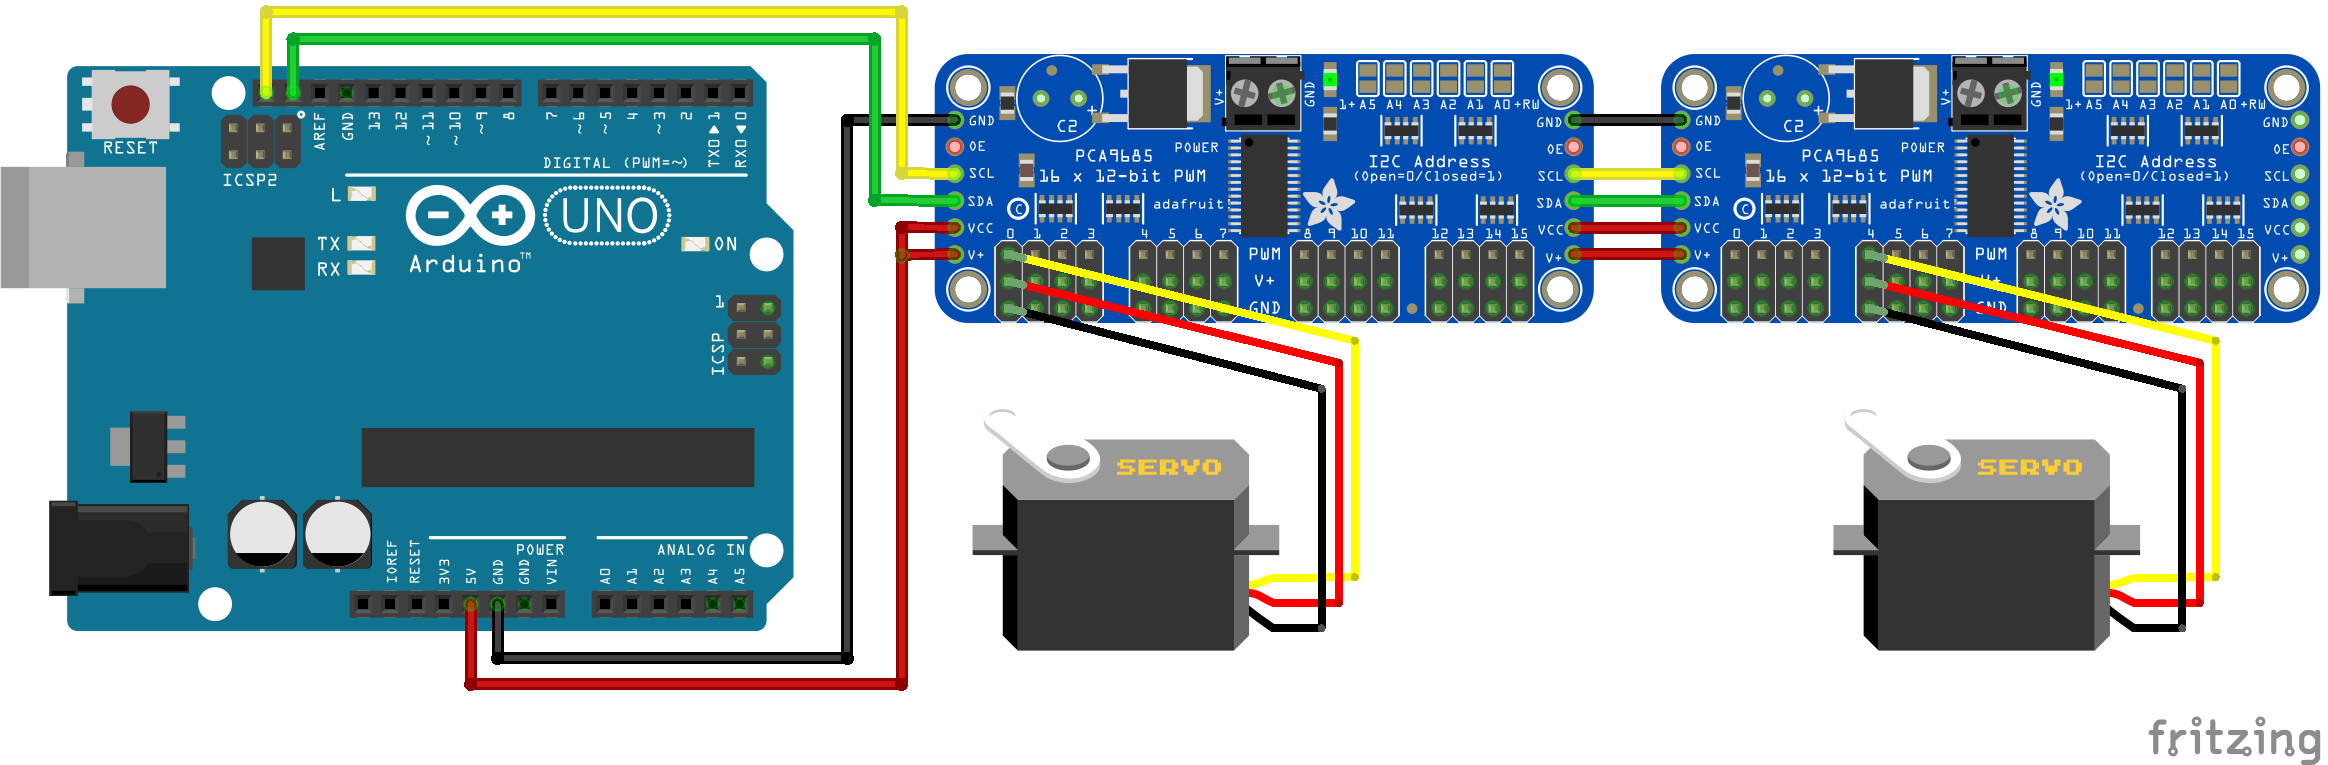 Servo Arduino multiple PCA9685